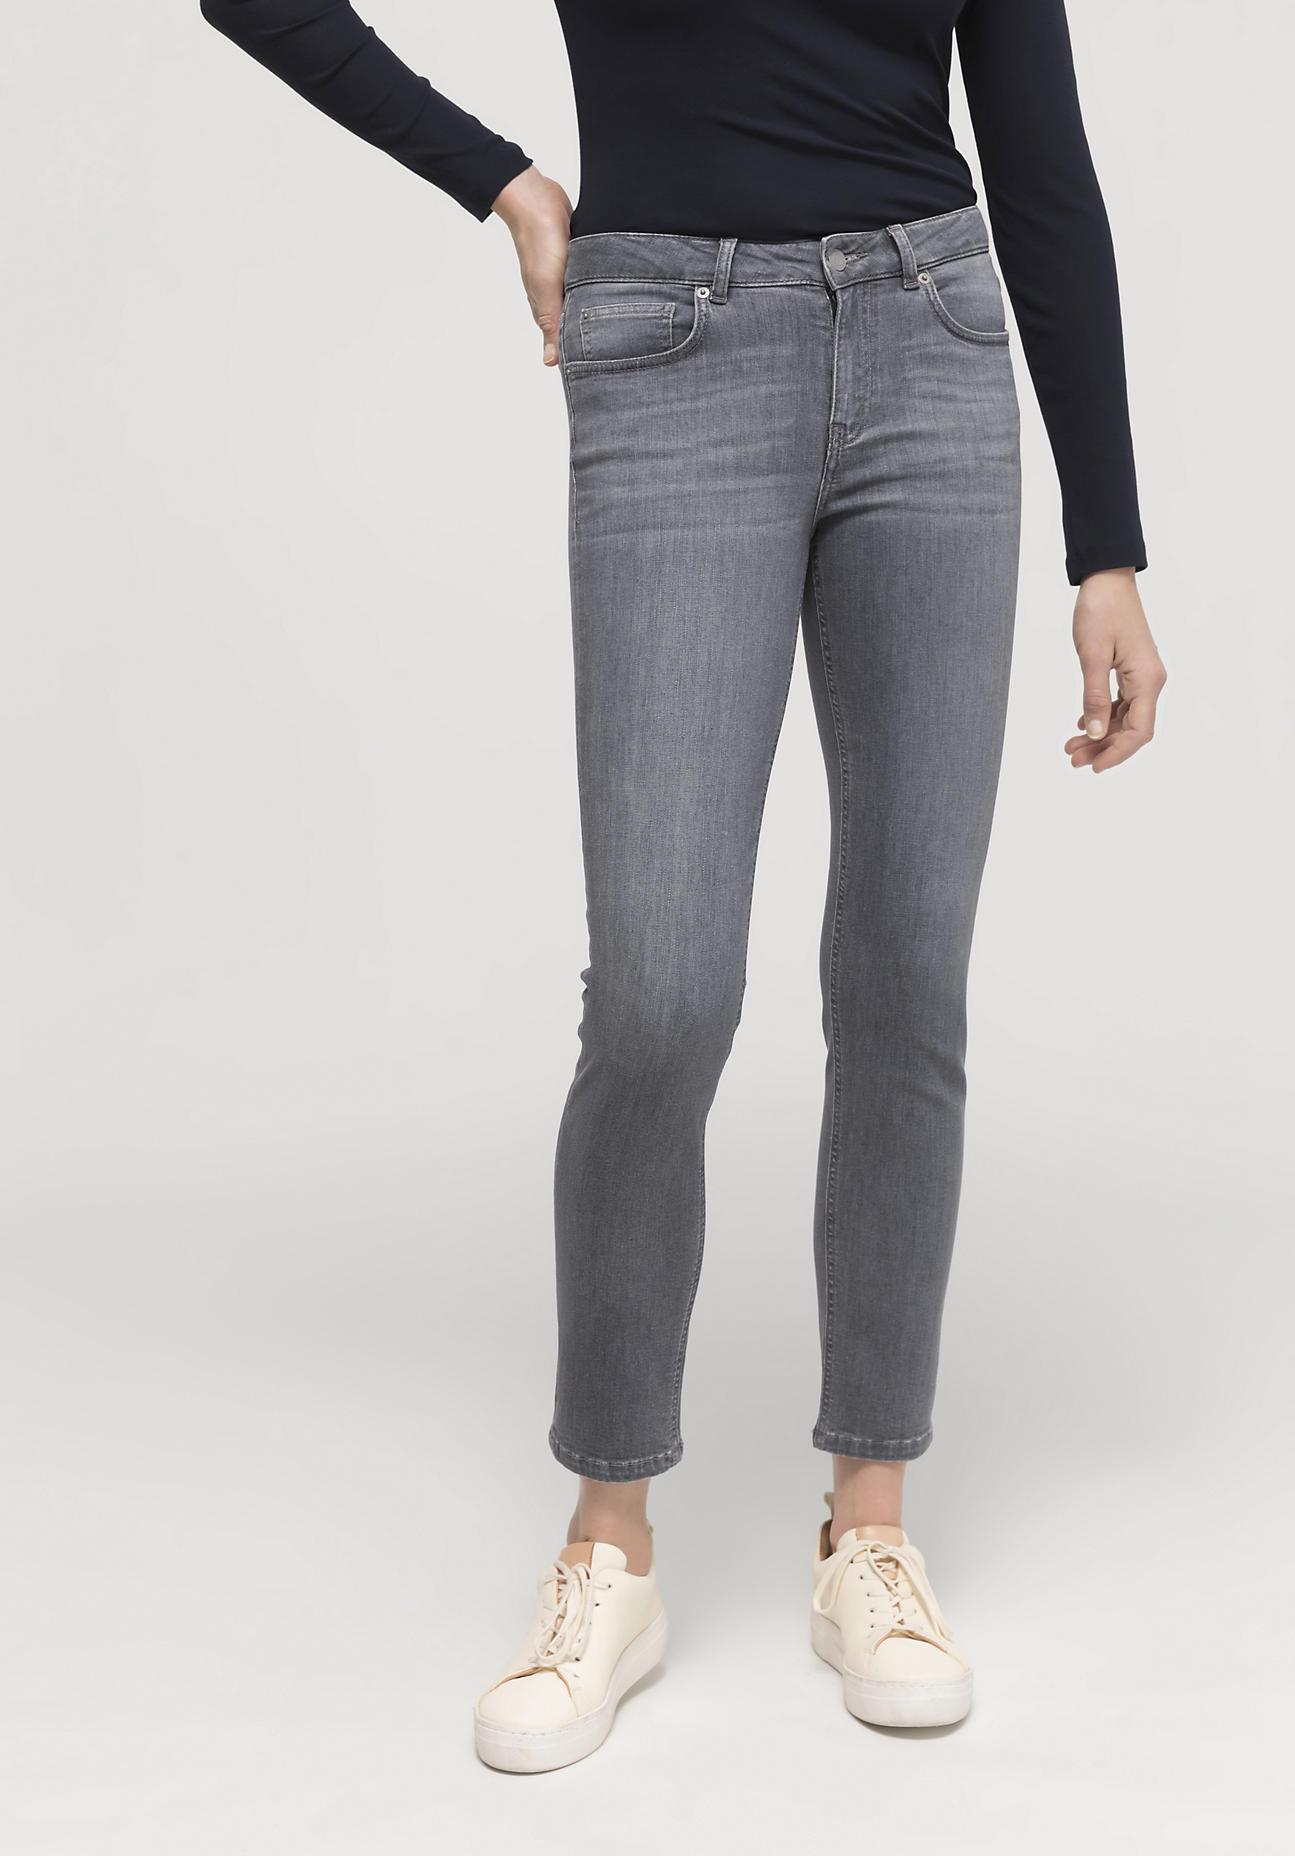 hessnatur Damen Jeans Lea Slim Fit aus Bio-Denim - grau Größe 30/30